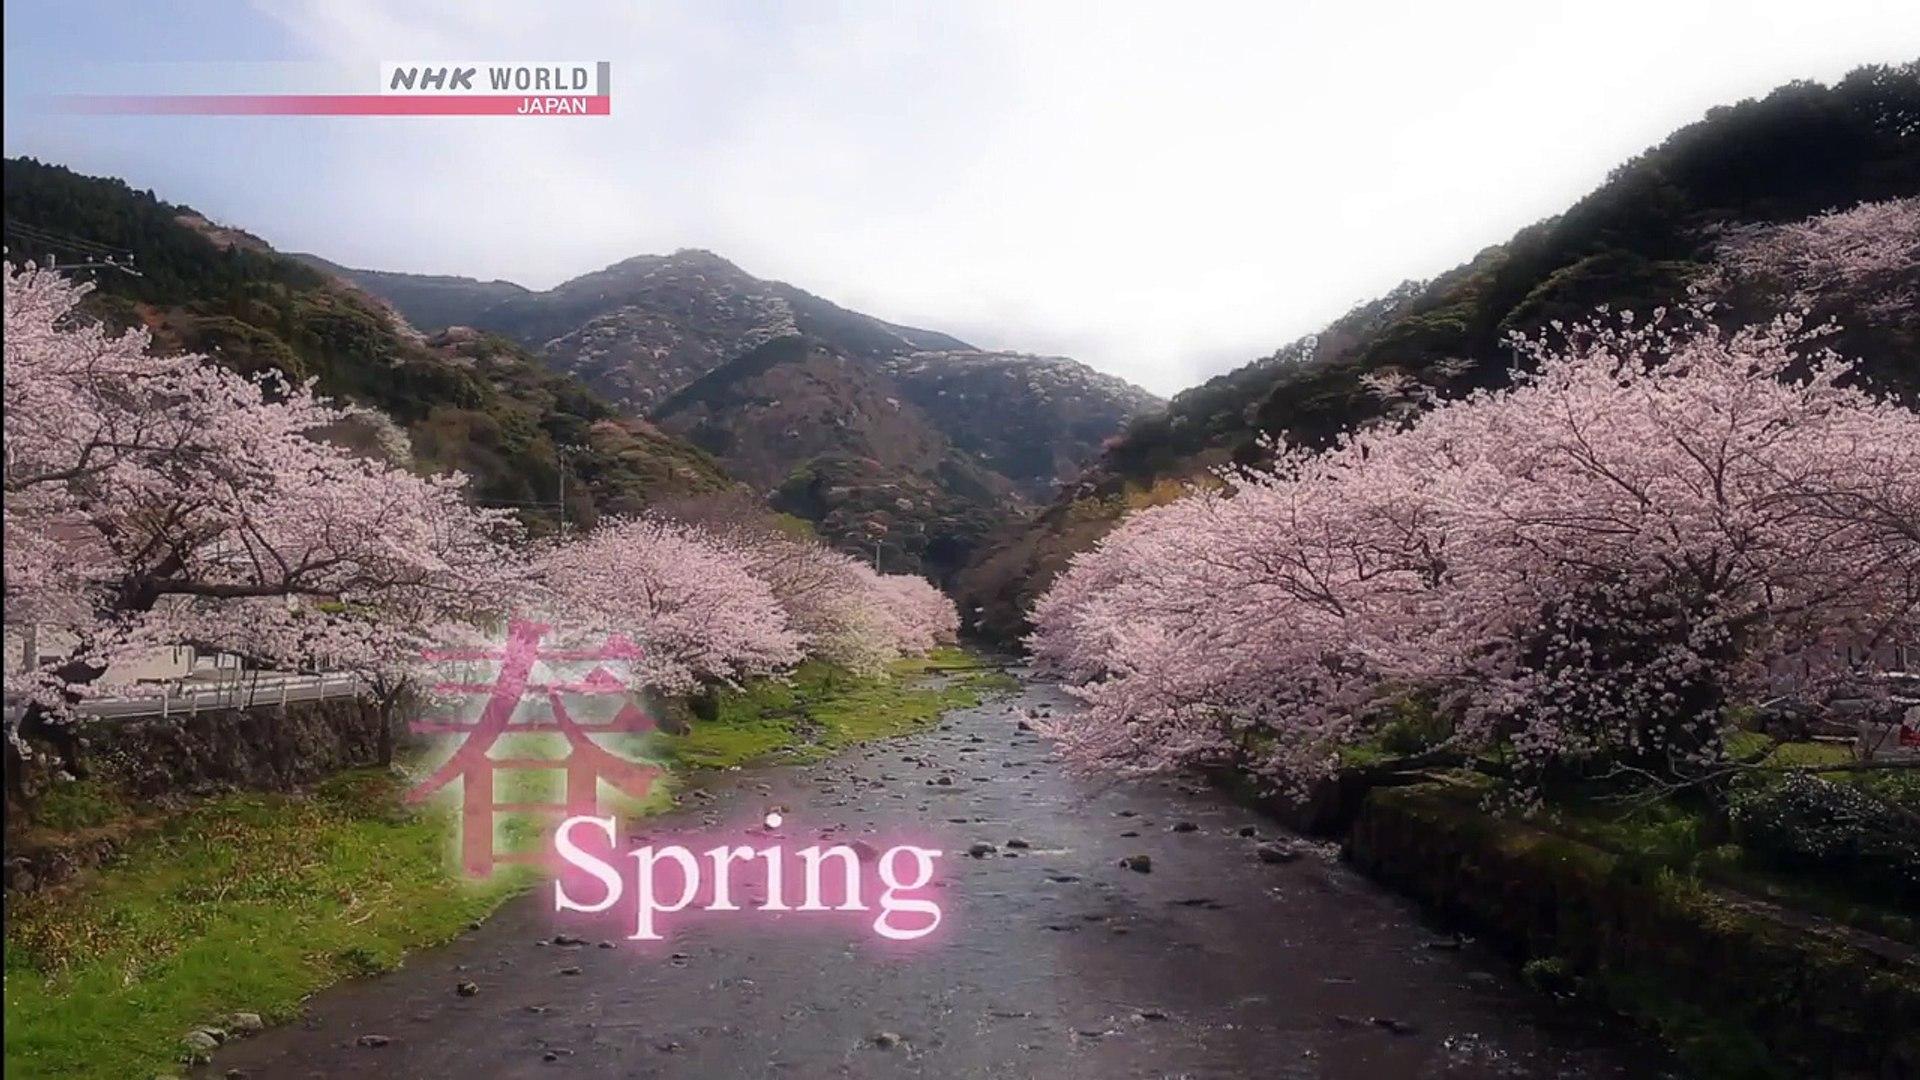 Spring Journey in Izu, Mt Fuji - CYCLE AROUND JAPAN - Video On Demand - NHK  WORLD - English